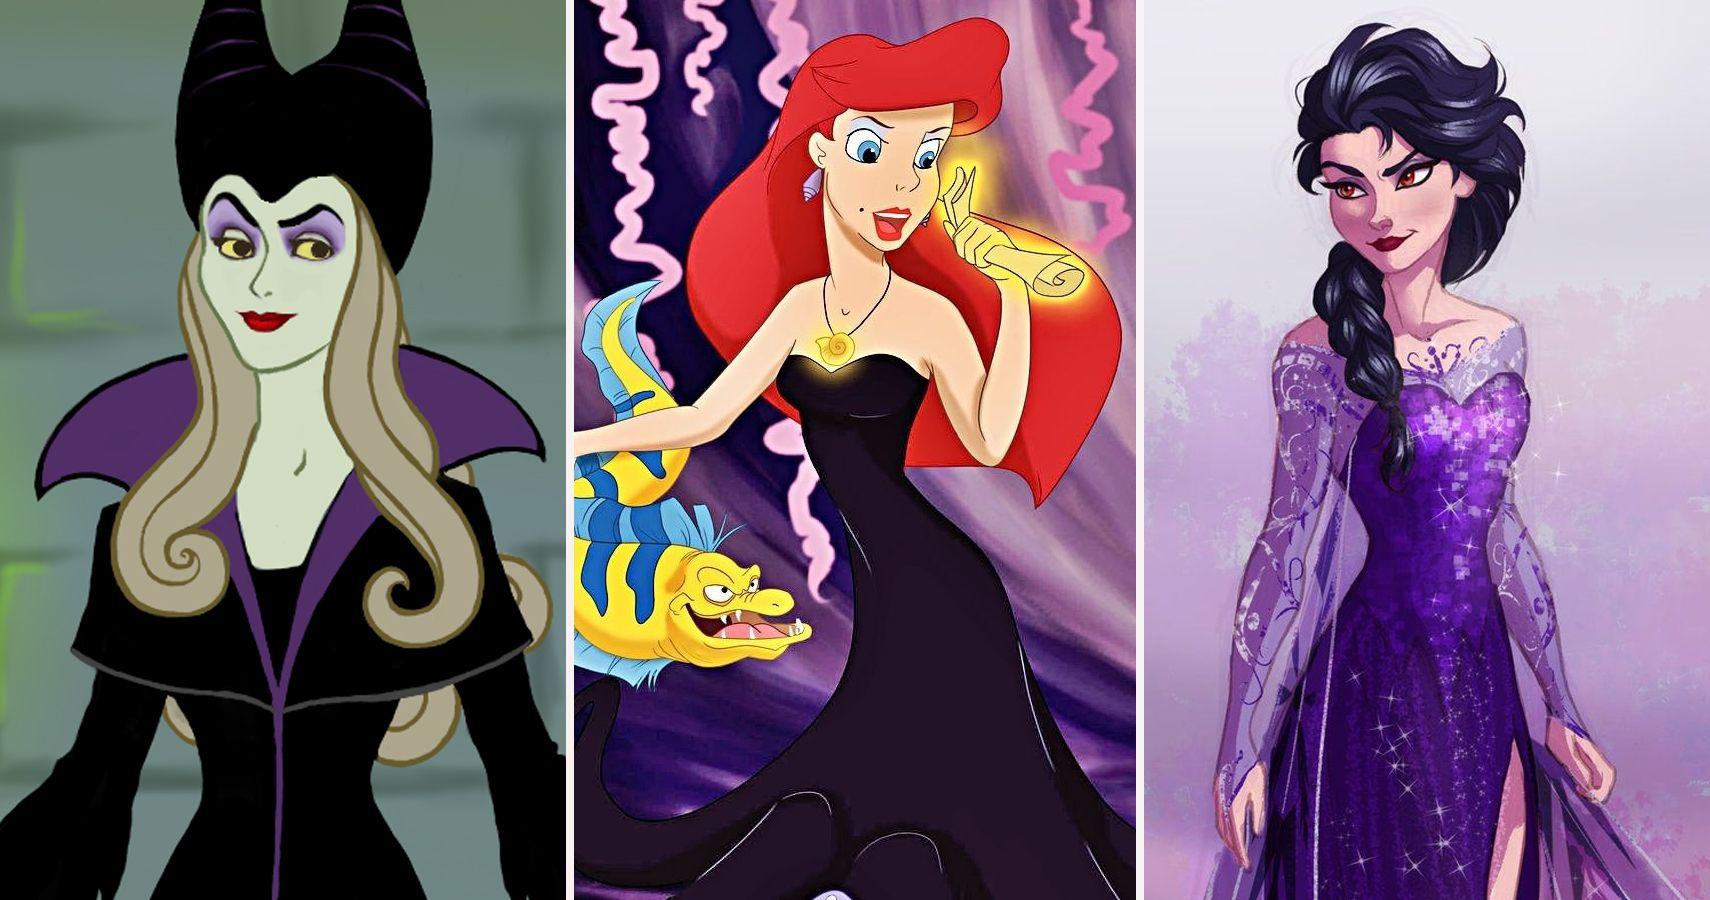 25 Disney Princes And Princesses Reimagined As Villains